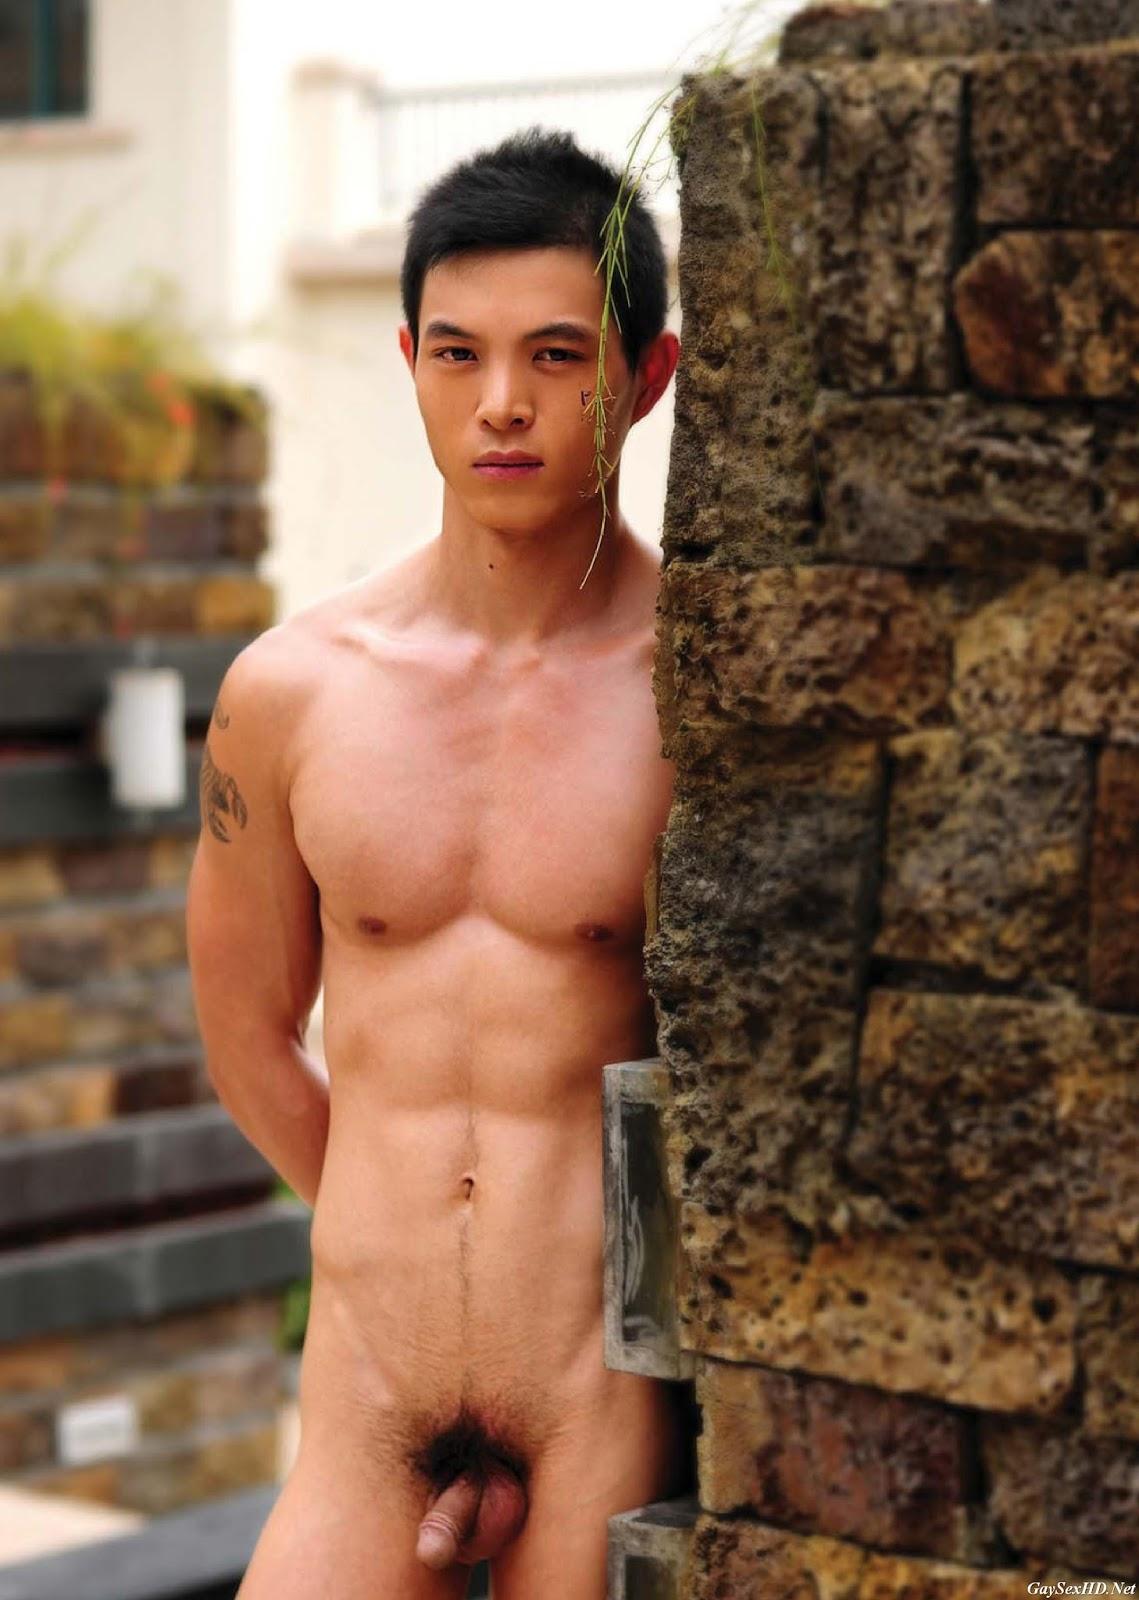 Naked male models asian